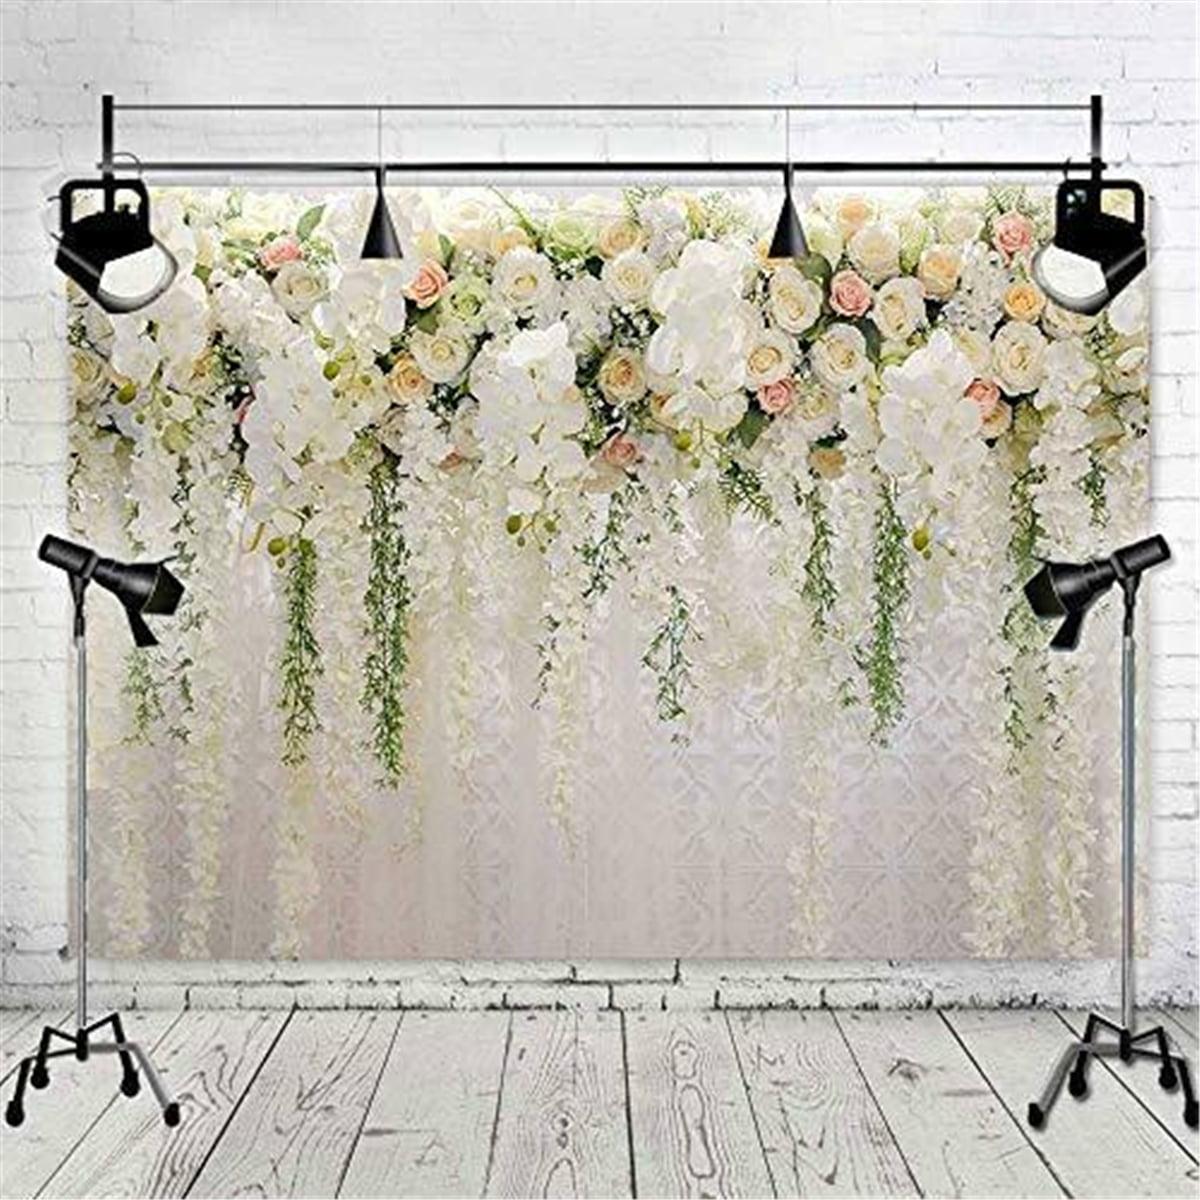 8x8FT Vinyl Backdrop Photographer,Floral,Romantic Love Bouquet Background for Party Home Decor Outdoorsy Theme Shoot Props